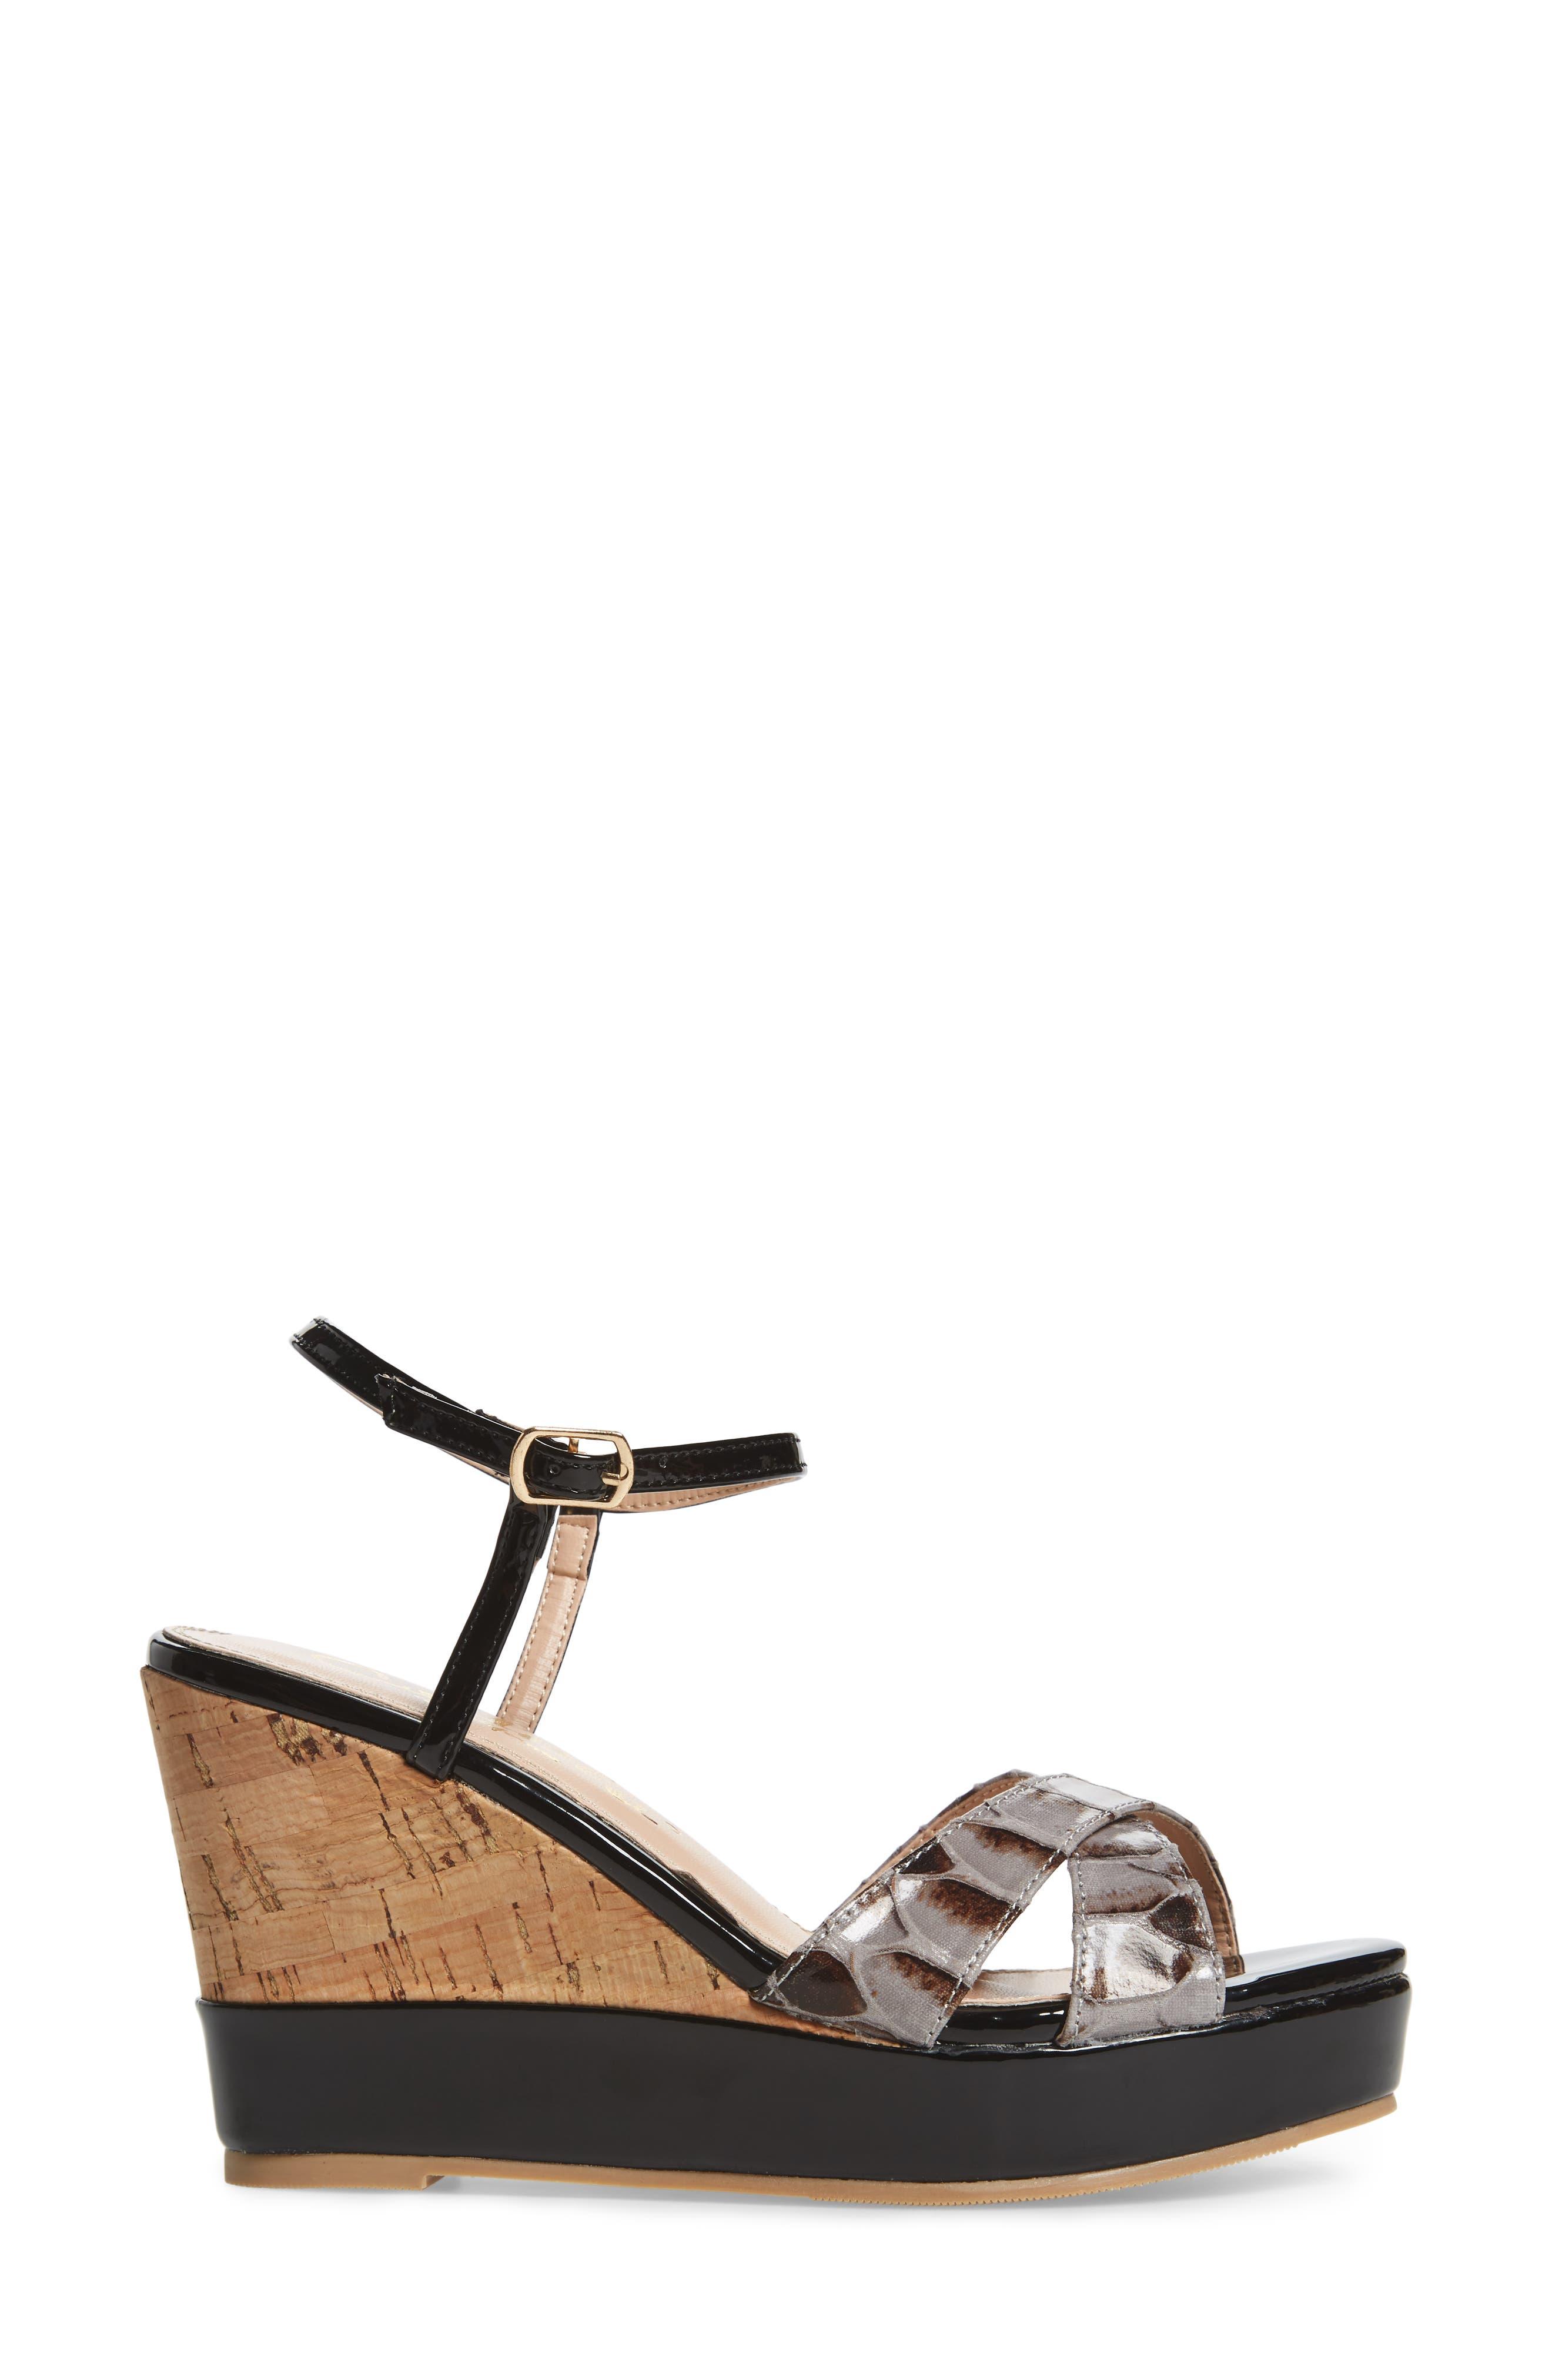 Lottie Platform Wedge Sandal,                             Alternate thumbnail 3, color,                             BLACK SYNTHETIC